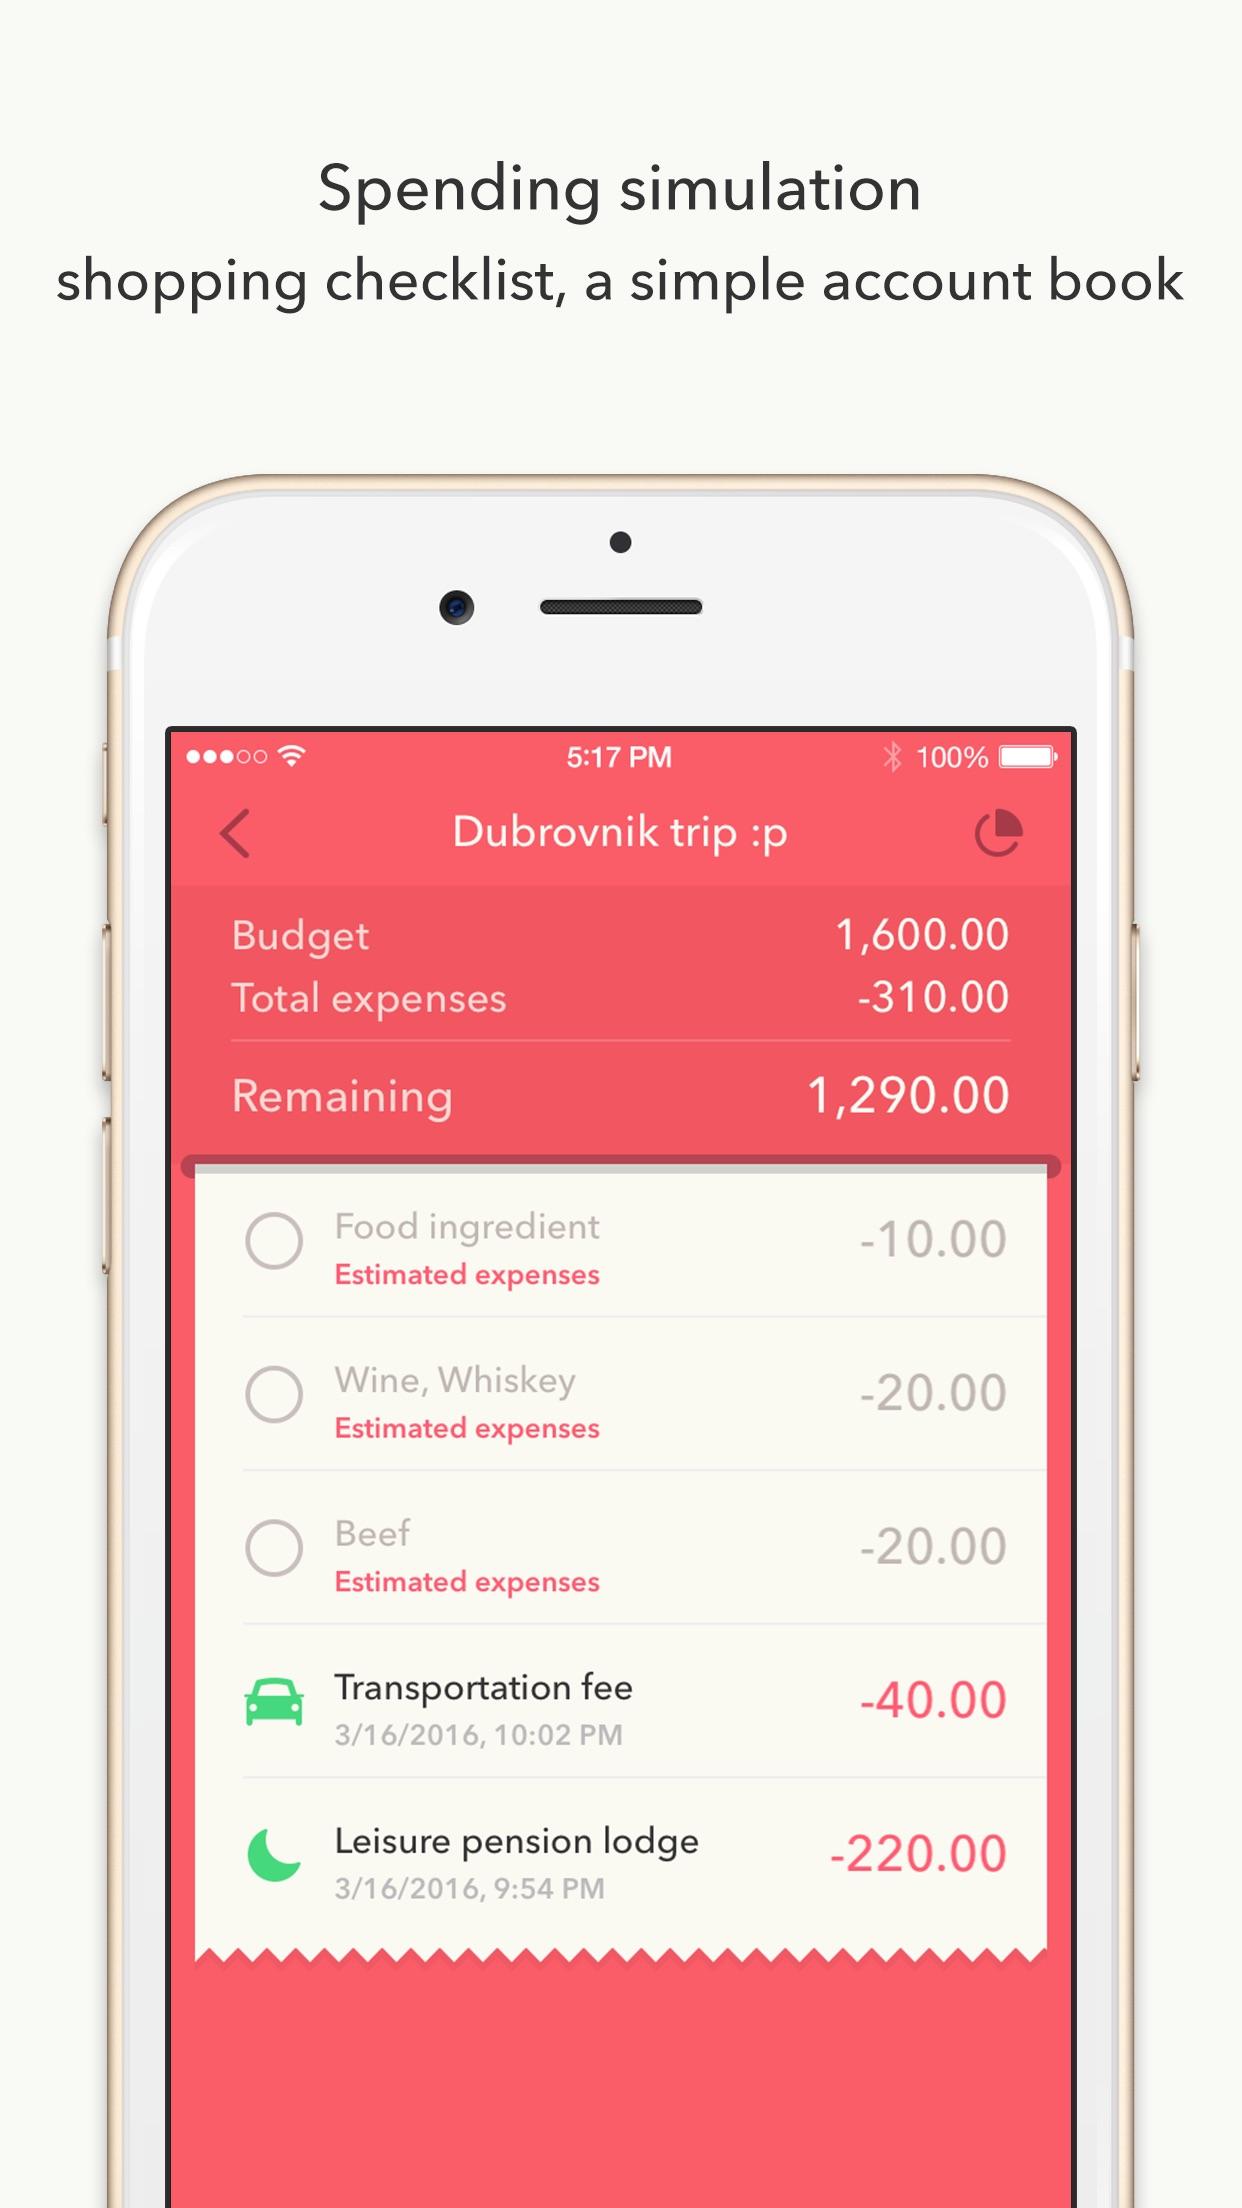 Minibudget Pro - Managing on a low budget Screenshot